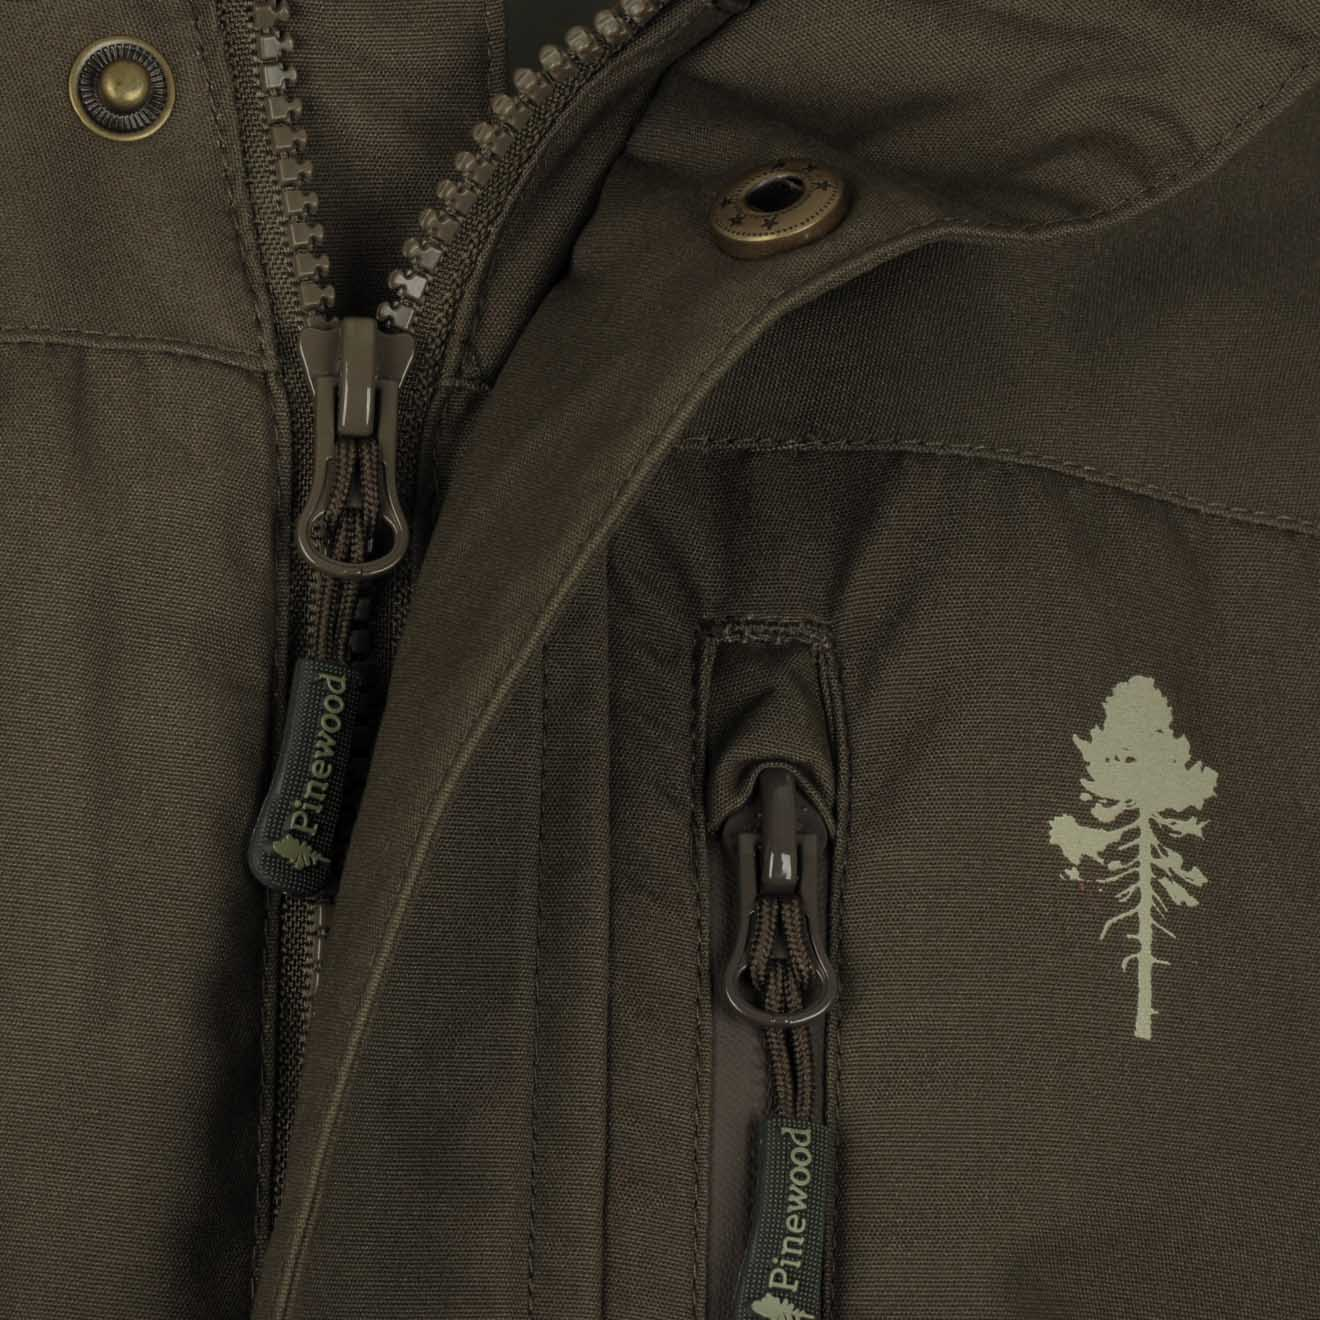 6ba5c3c9d Pinewood Caribou TC Extreme Jacket Dark Olive - The Sporting Lodge